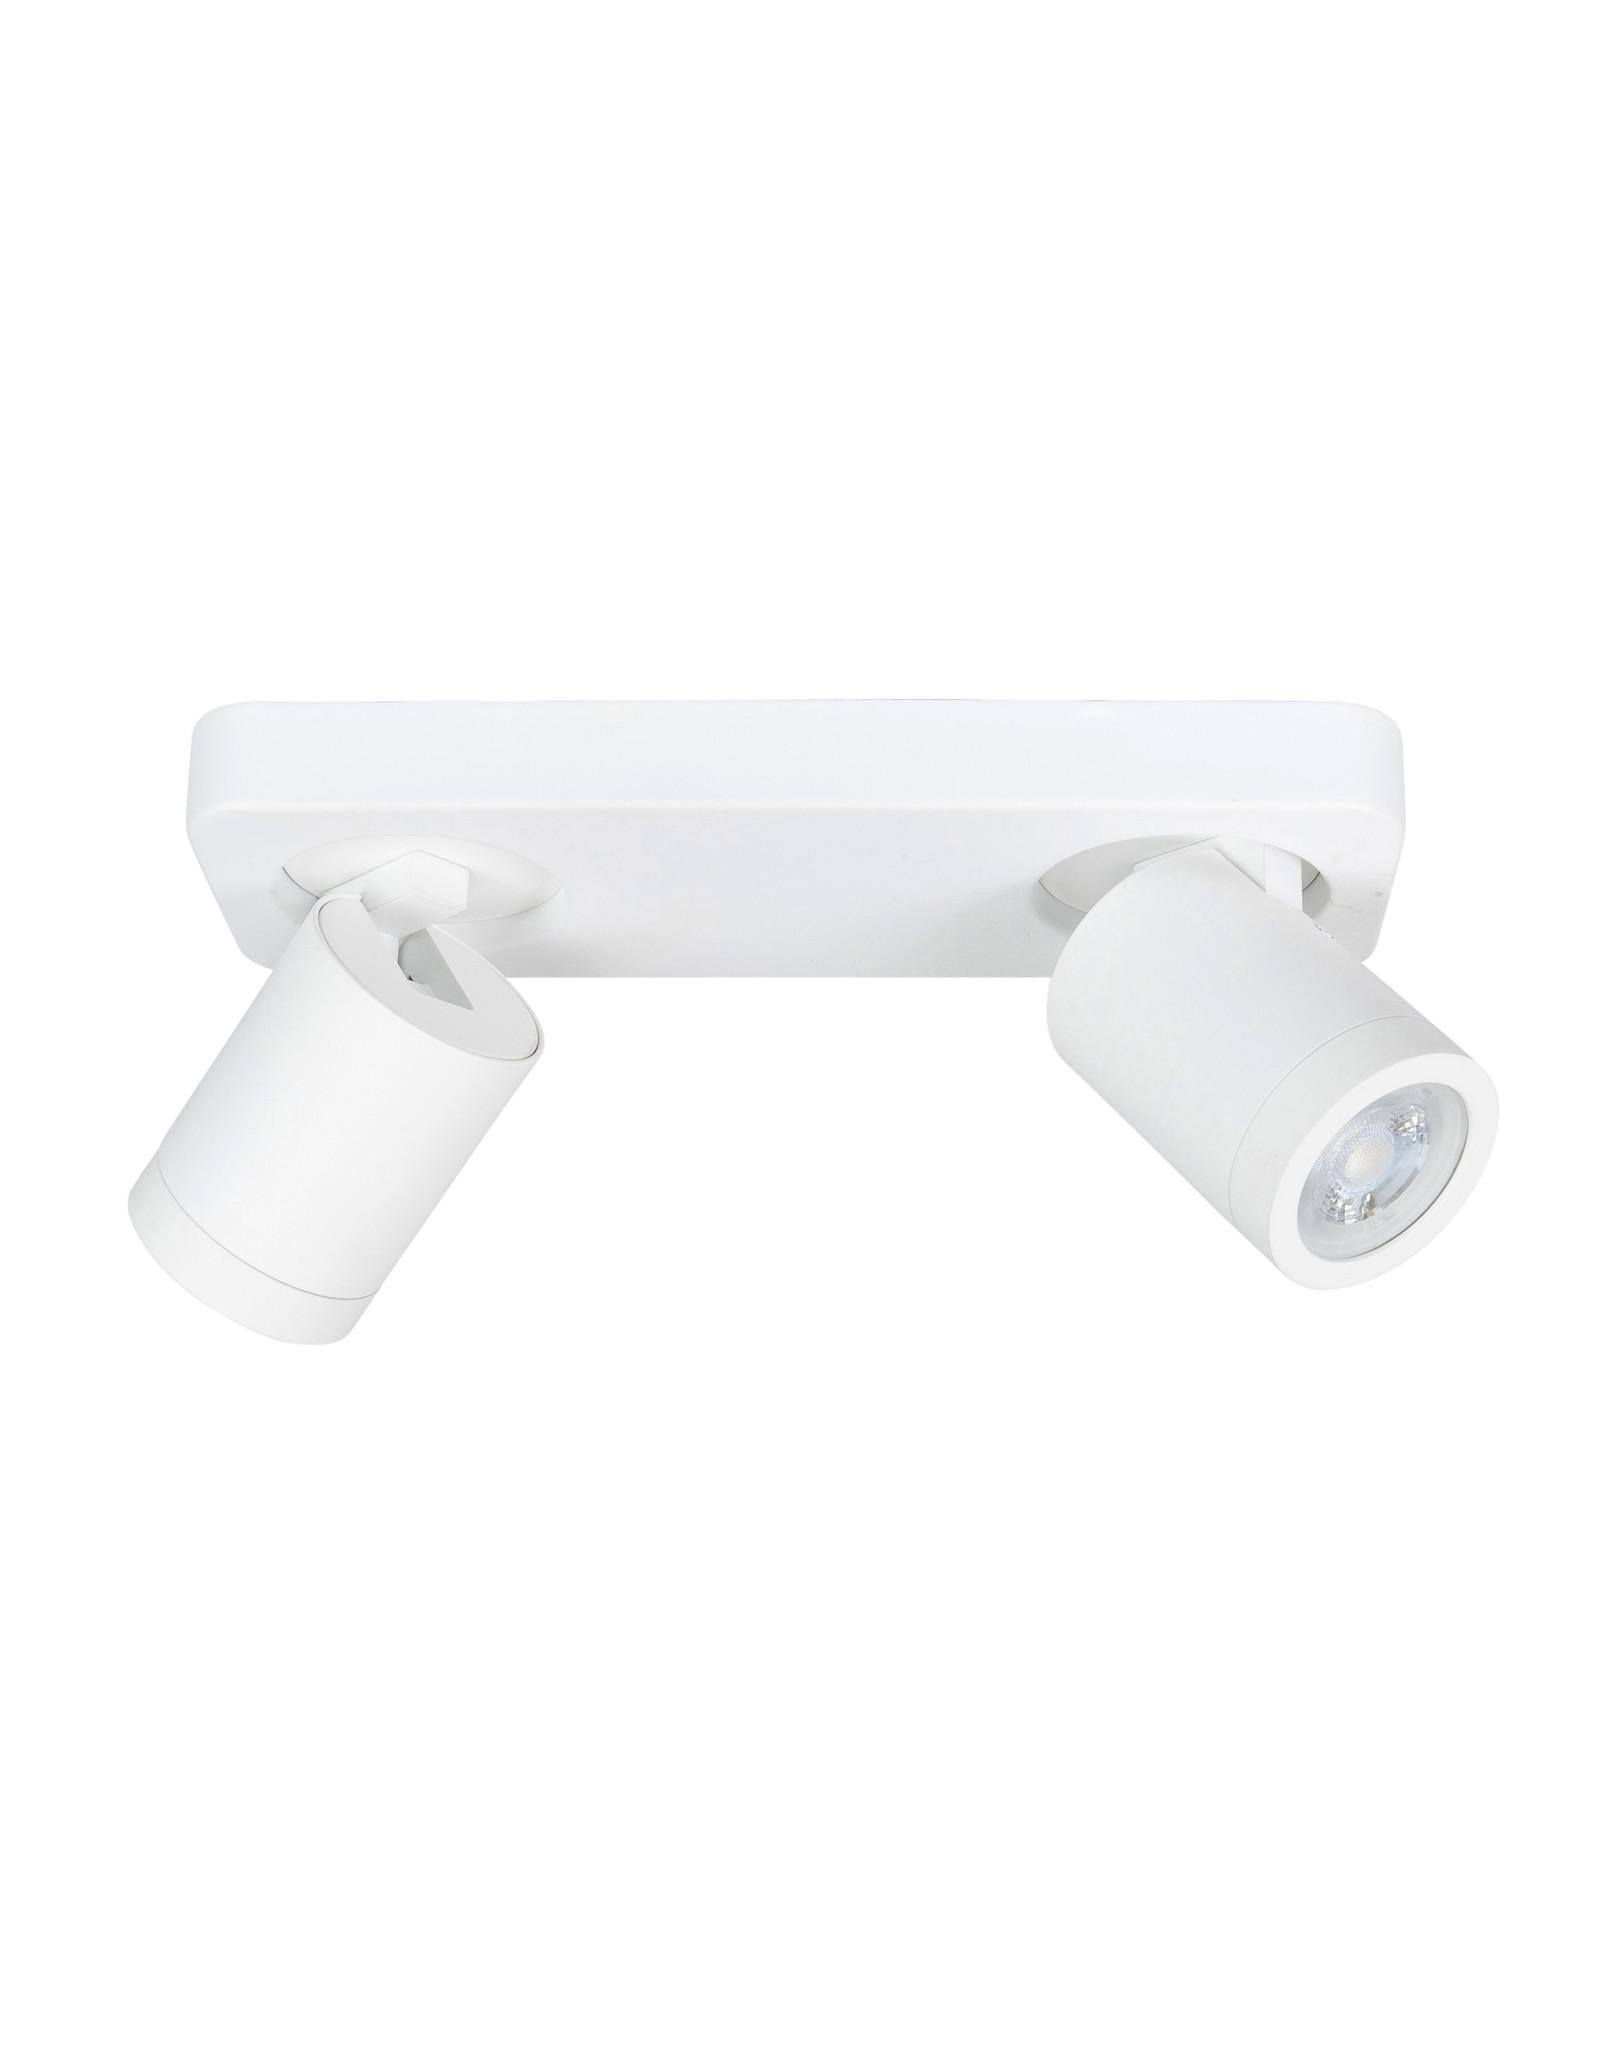 Oliver spot 2 X  GU10 LED IP44 balk Mat Wit zonder lampen